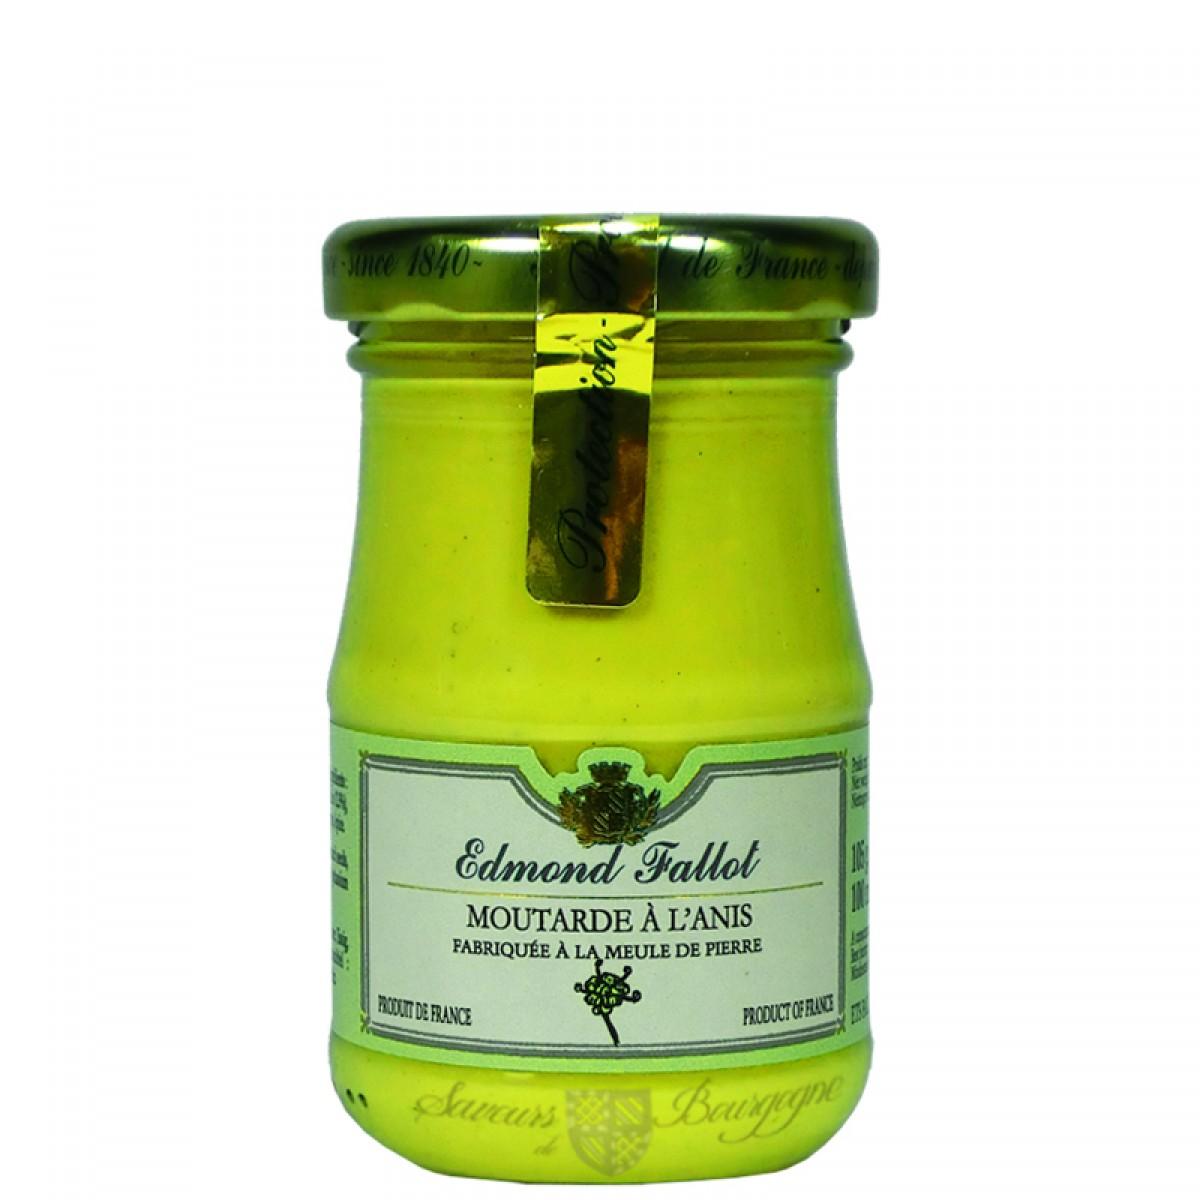 Moutarde l 39 anis 100g fallot saveurs de bourgogne vente de produits - Moutarde fallot vente ...